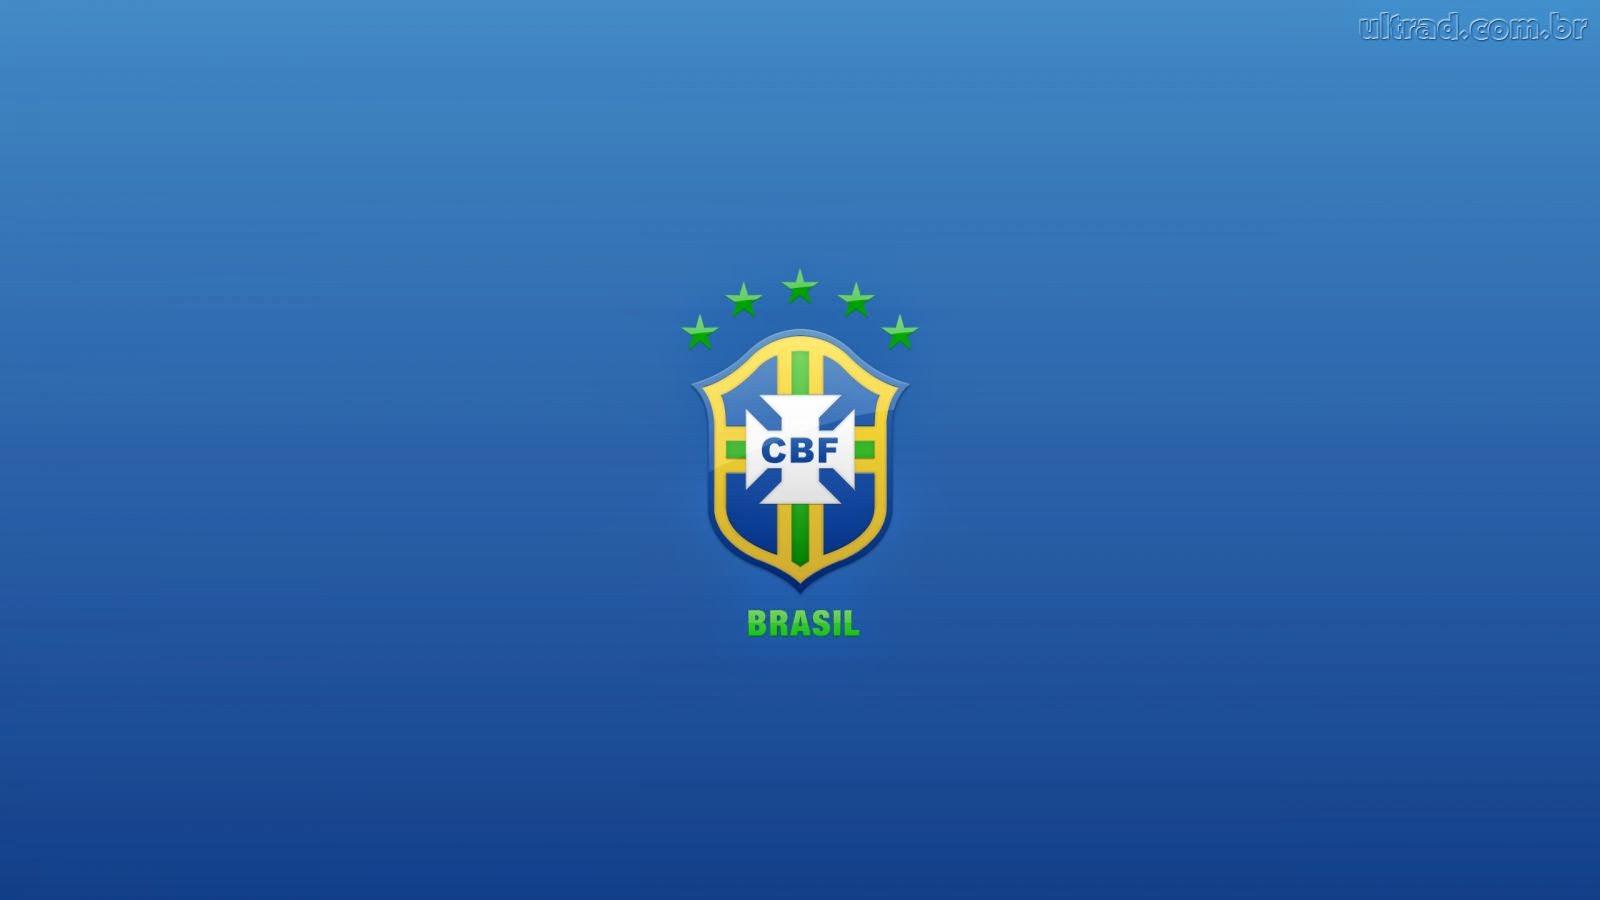 Wallpapers wallpapers da sele o brasileira for Papel de pared dorado